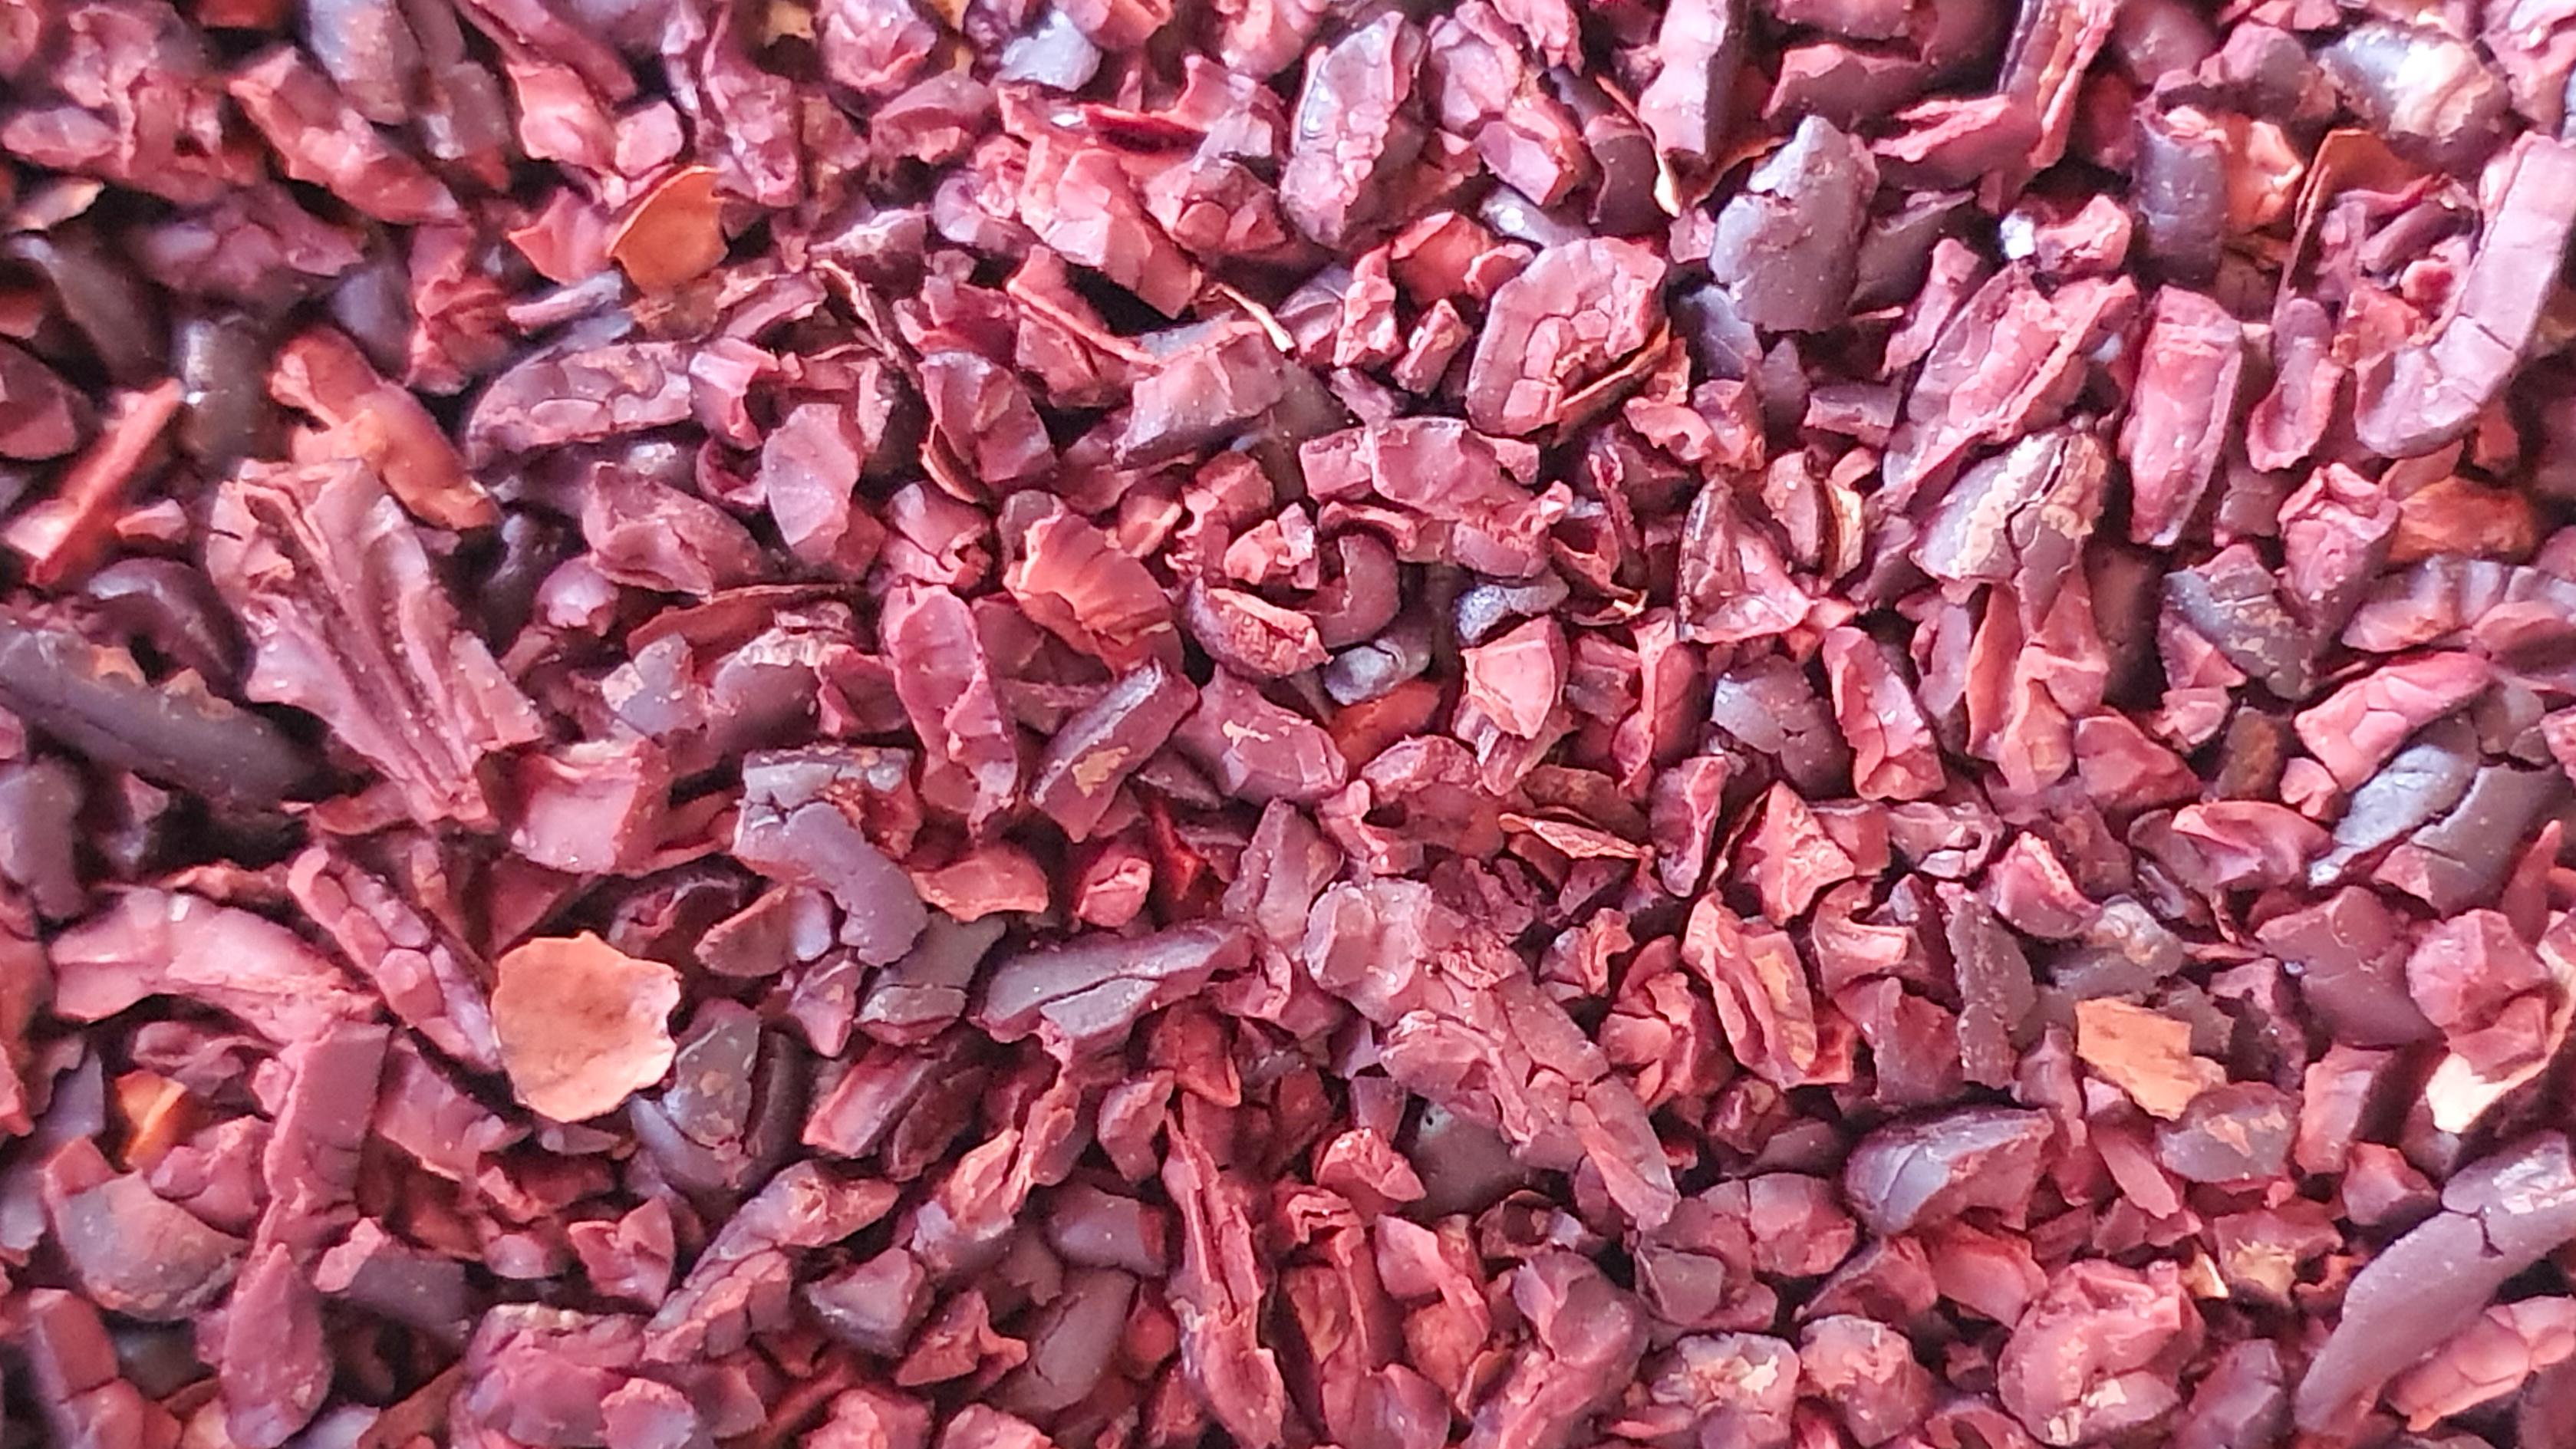 Raw dried cacao